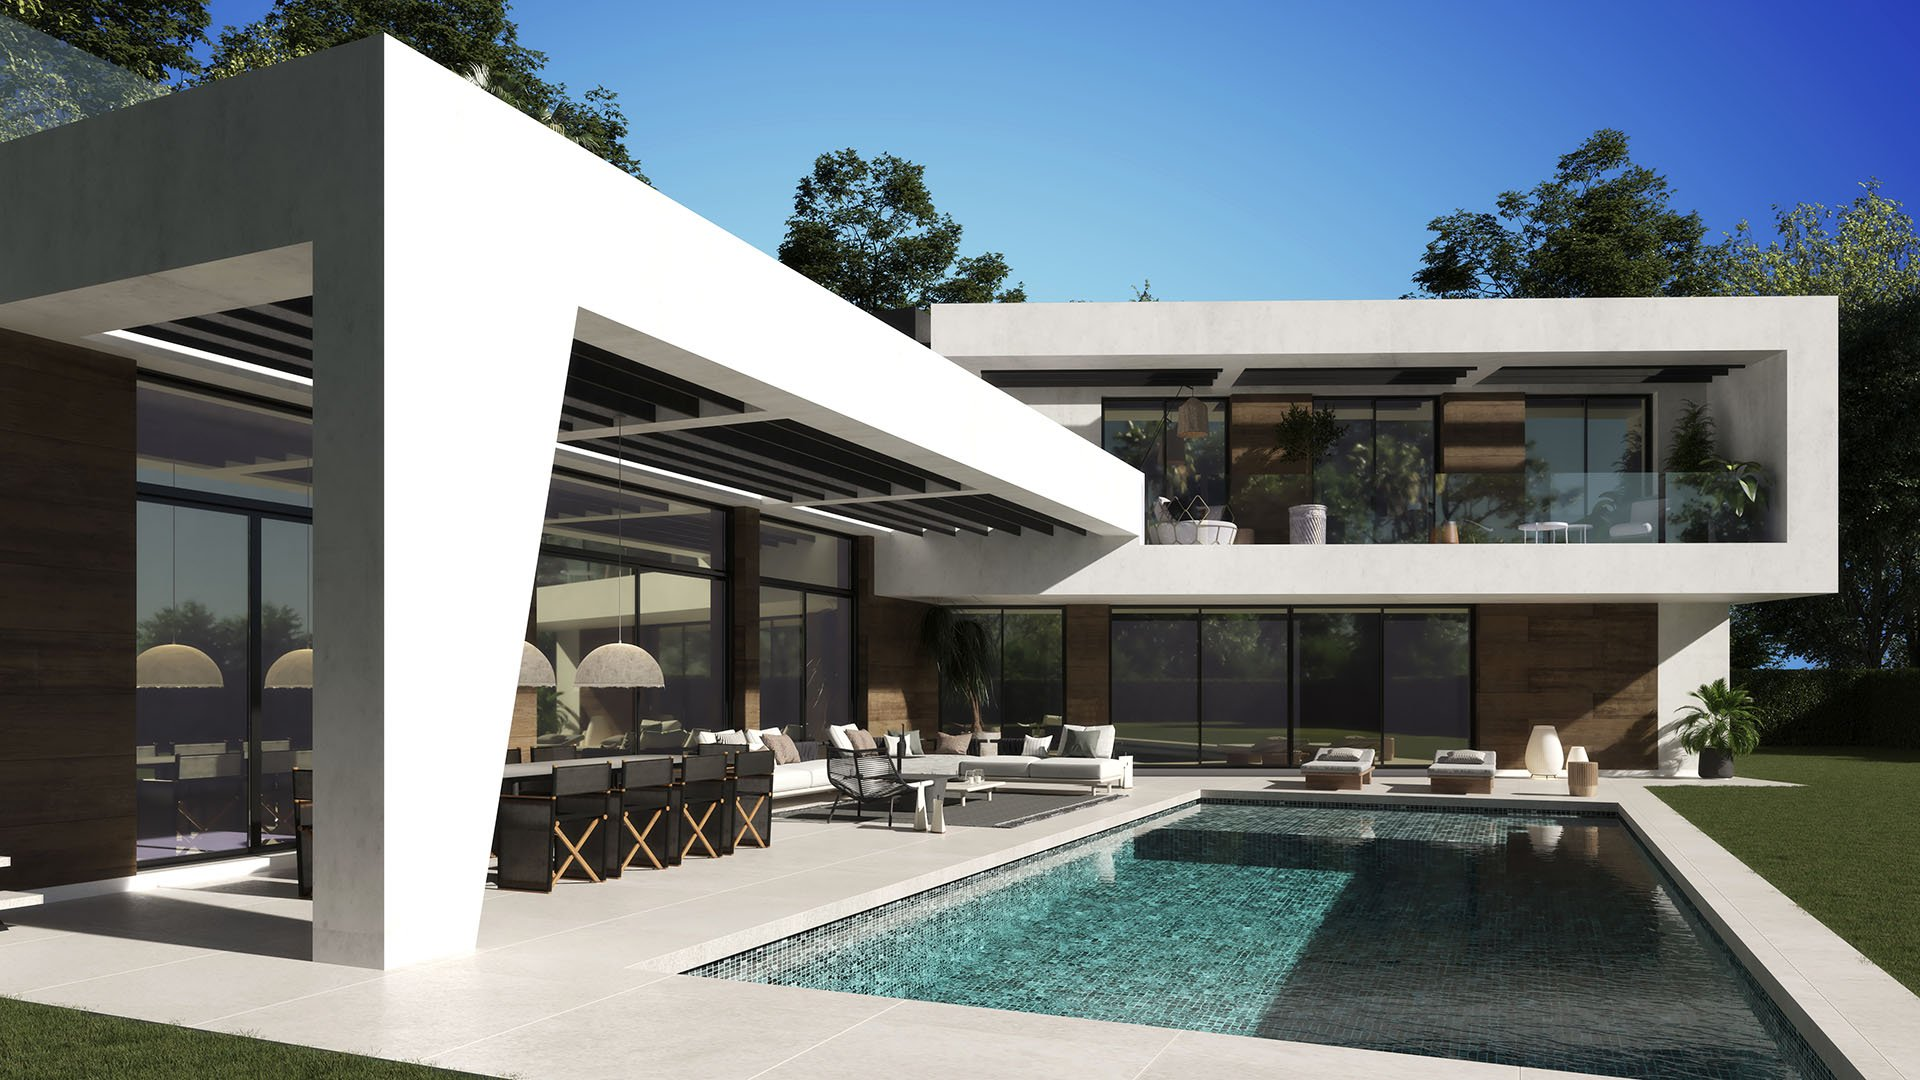 Villa Guadalmina Baja 197: Luxury villa within walking distance from the beach and amenities